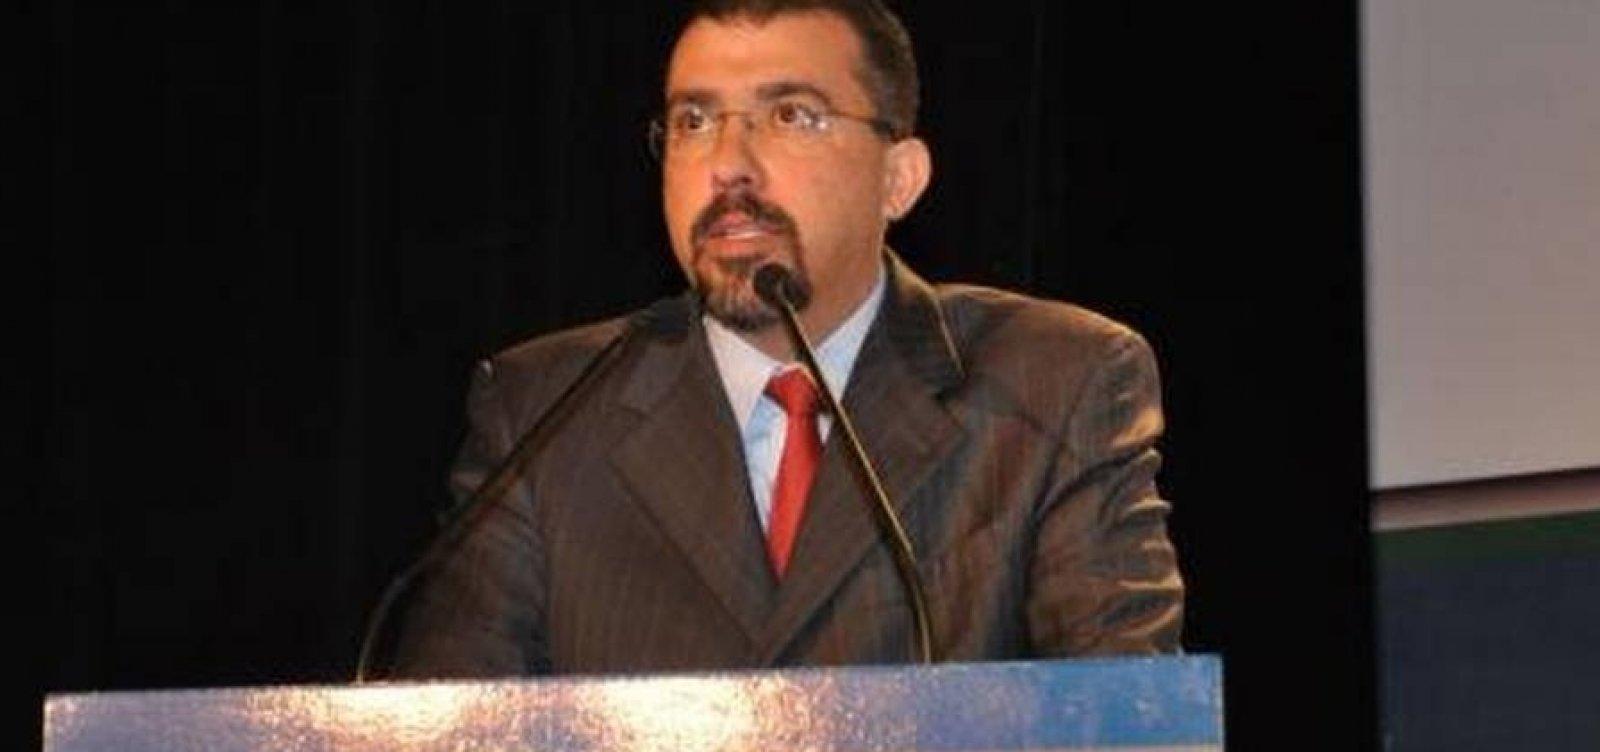 [CNMP suspende procurador baiano que chamou Bolsonaro de 'bunda-suja e fascista']